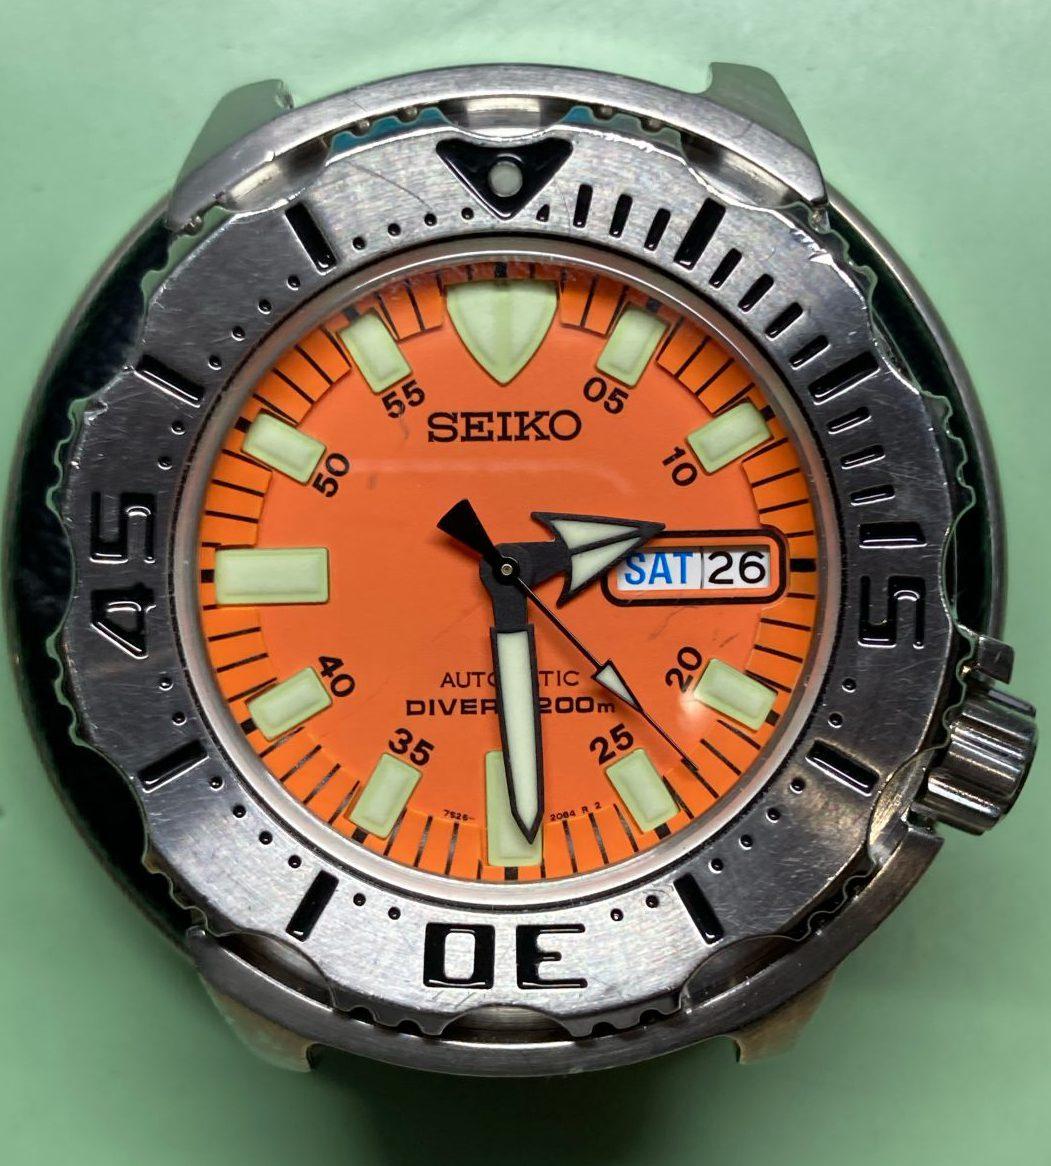 SEIKO 7S26-0350  ダイバーズウォッチ 新潟市にある時計修理工房ではオーバーホール、ポリッシュ加工も承っております